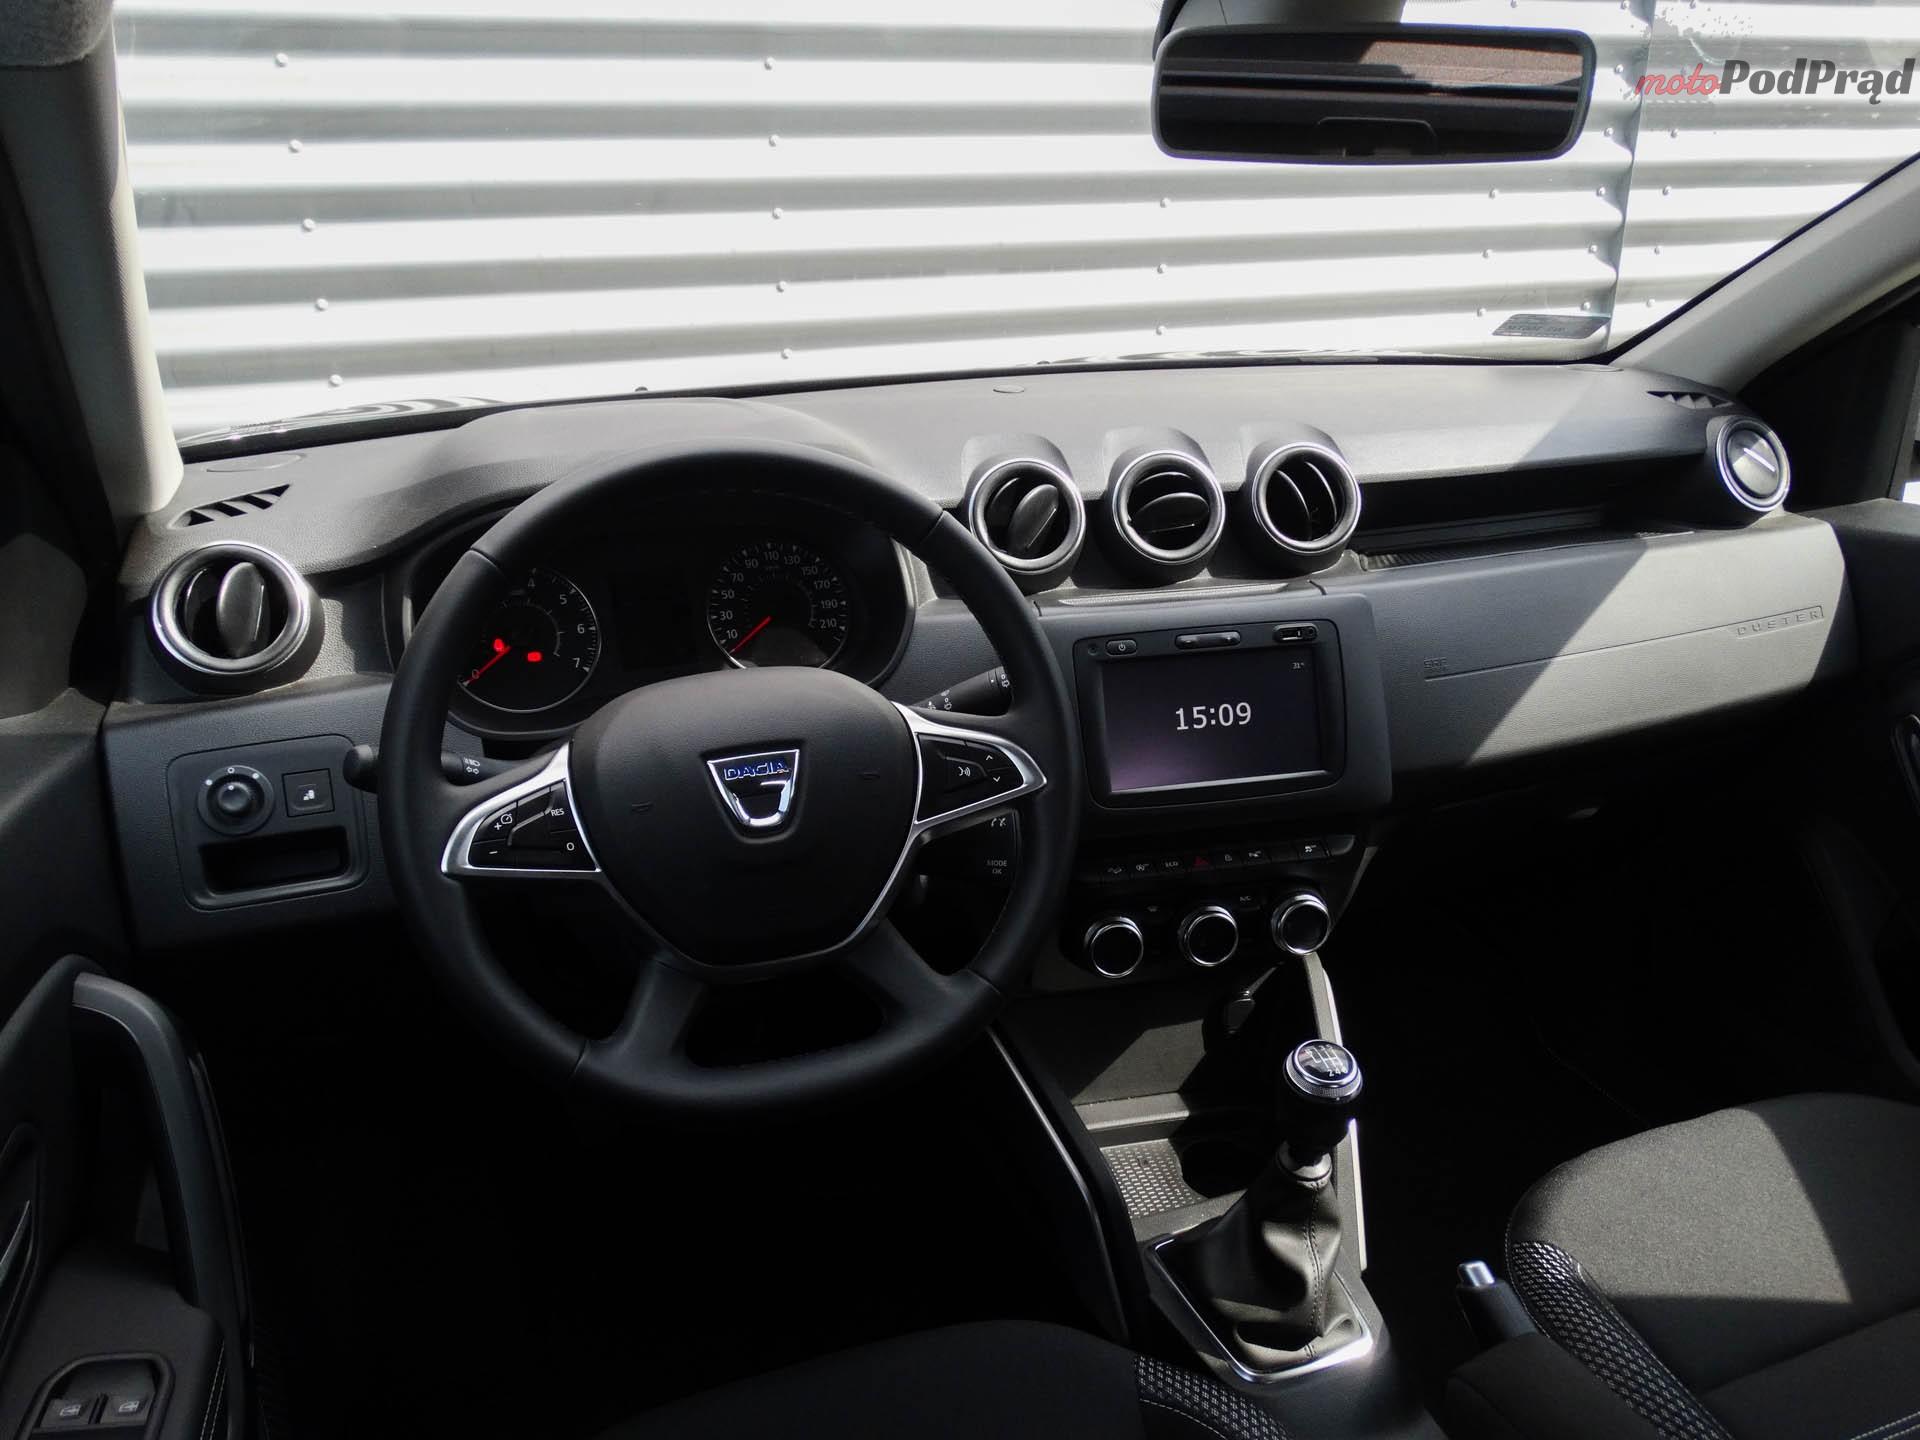 Dacia Duster 12 Test: Dacia Duster PRESTIGE 1.5 dci 4WD – w prostocie siła!